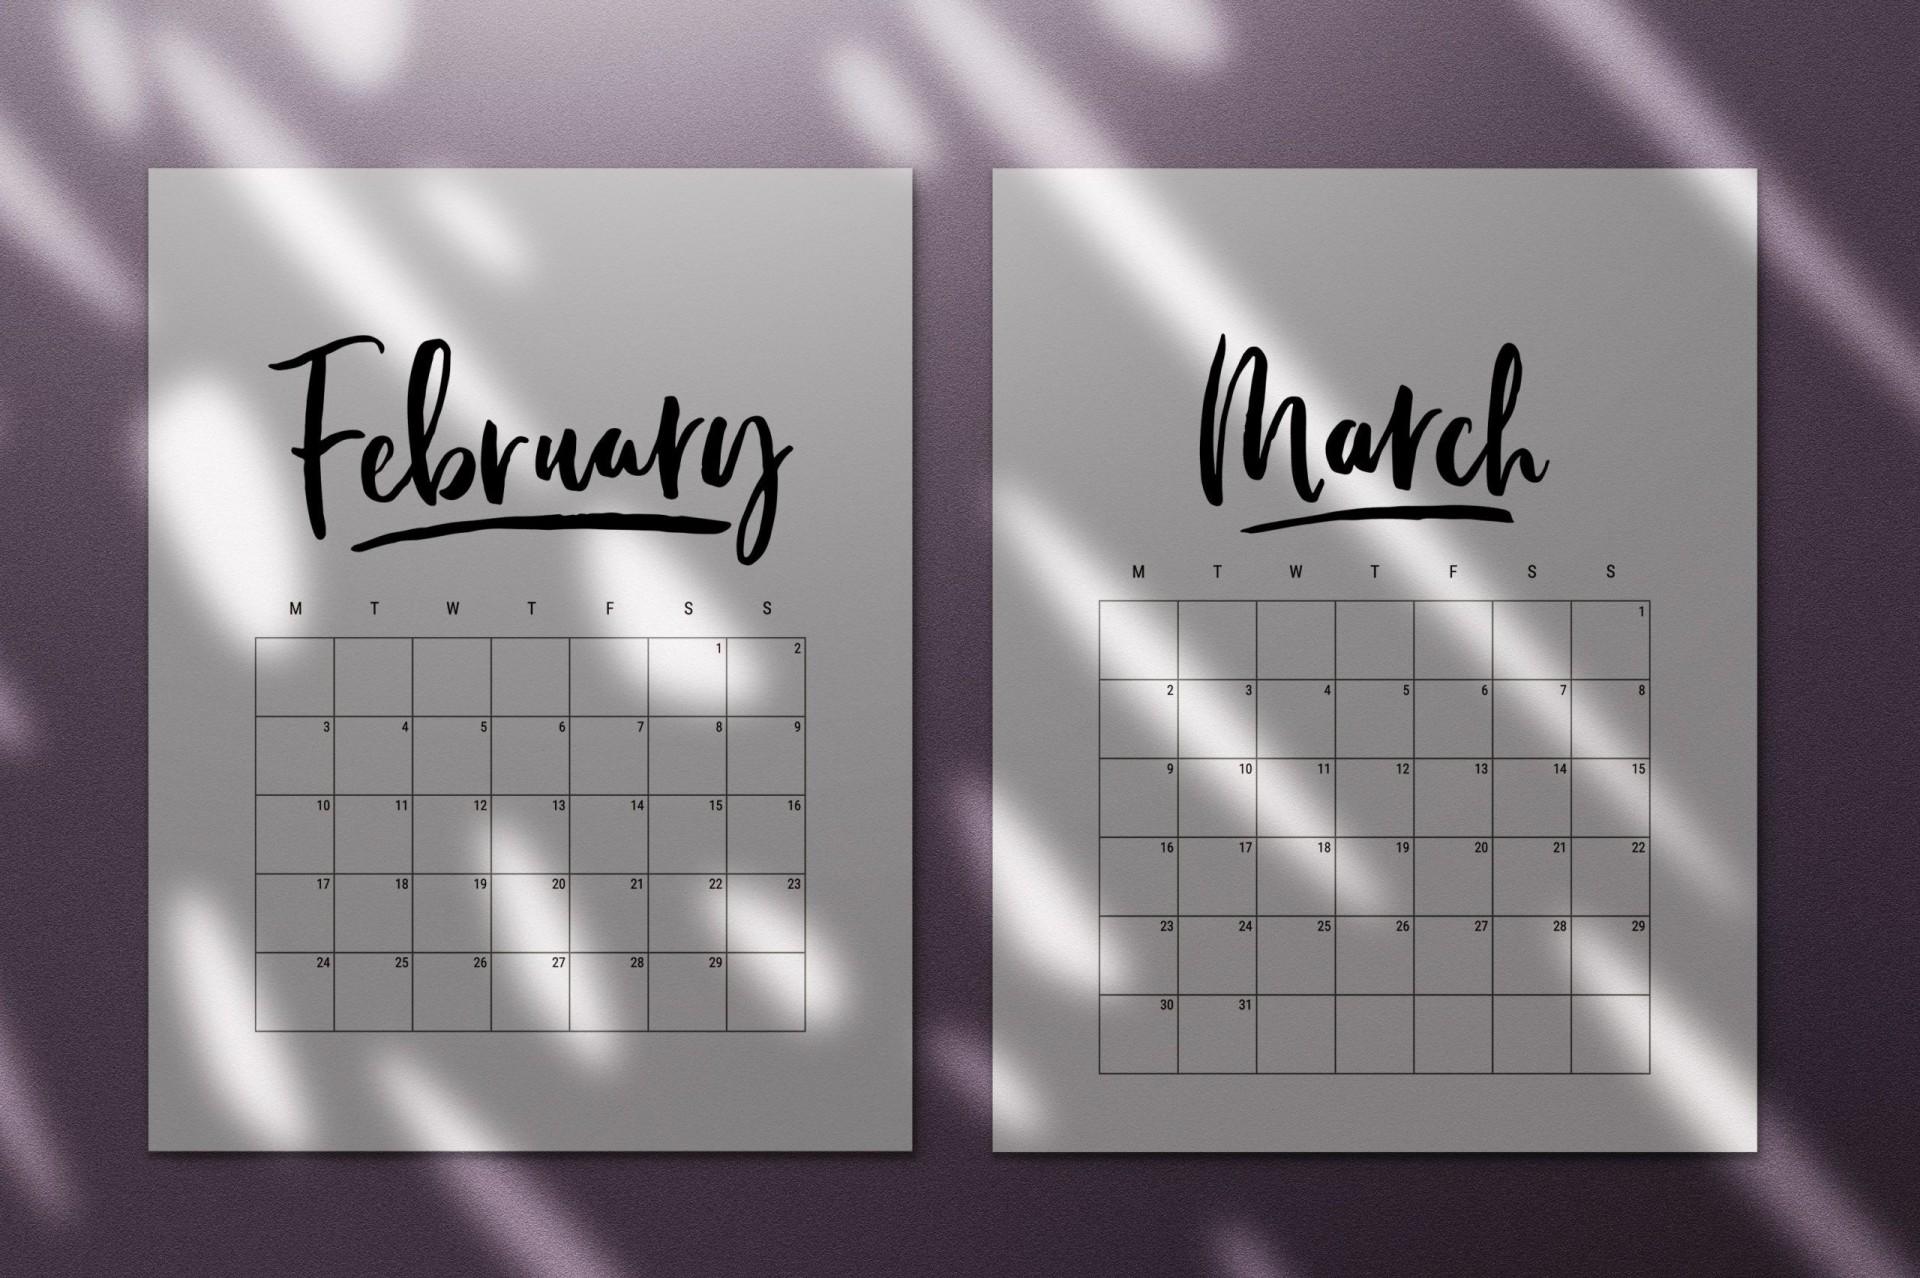 000 Breathtaking 2020 Calendar Template Indesign Image  Adobe Free1920